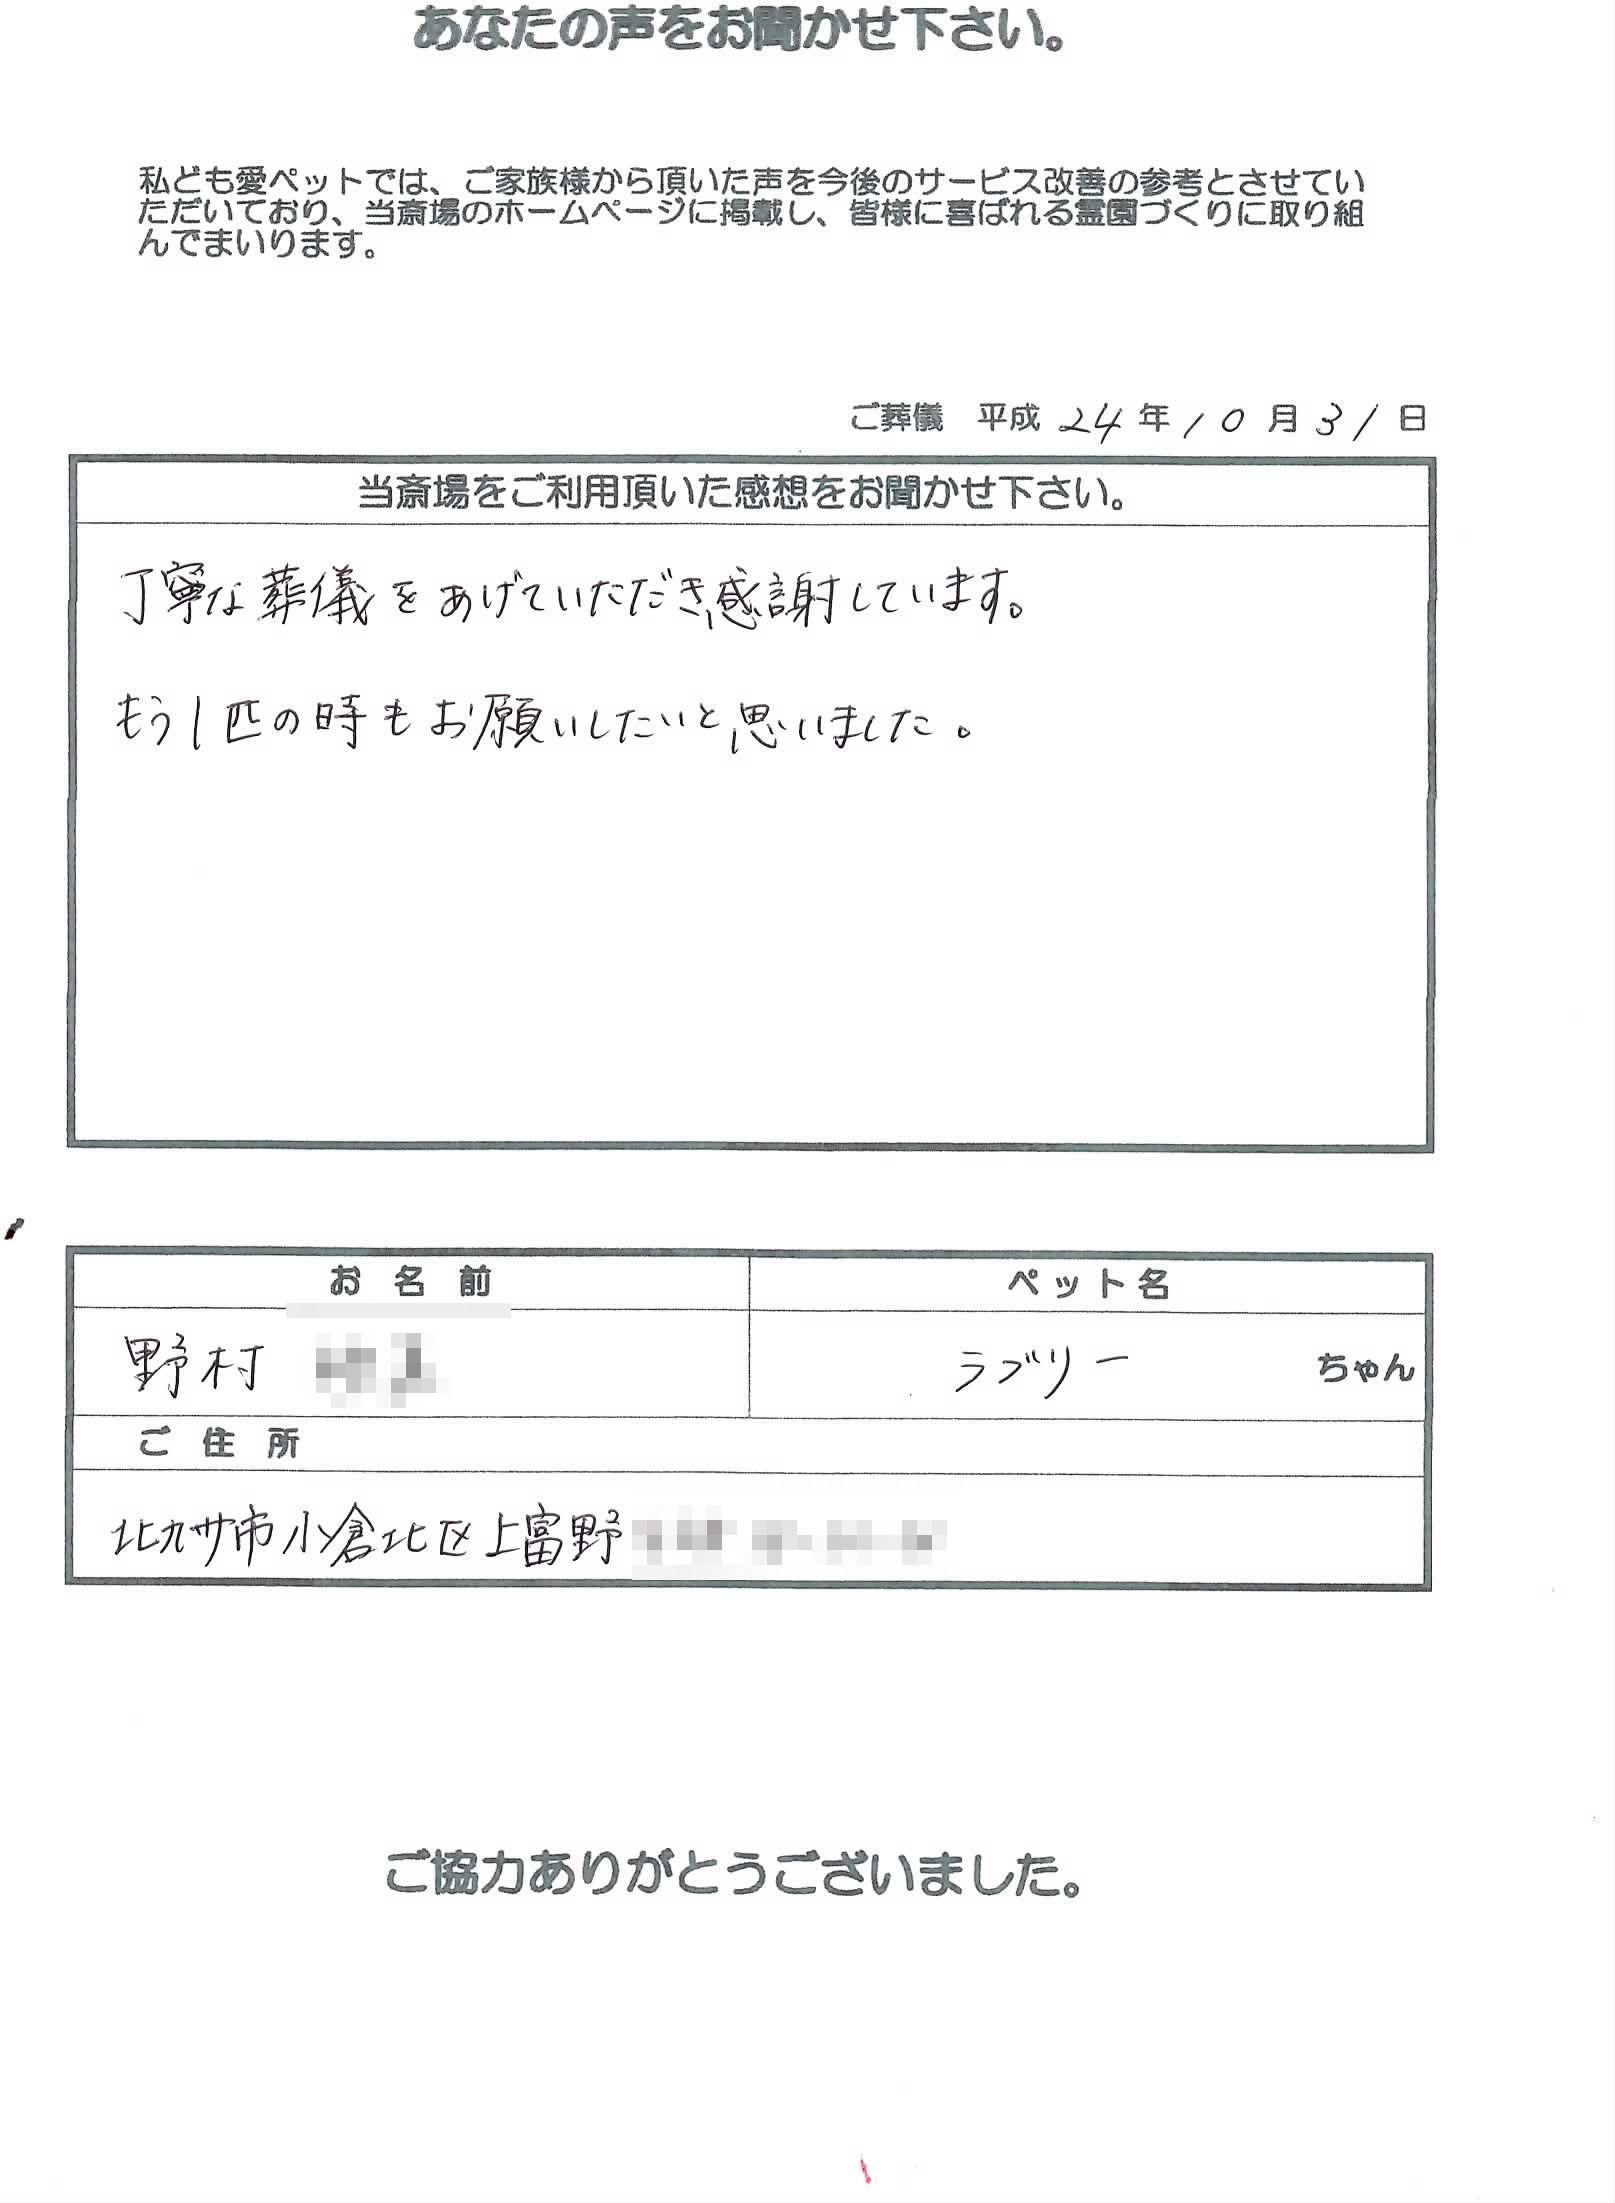 k121031-6.jpg